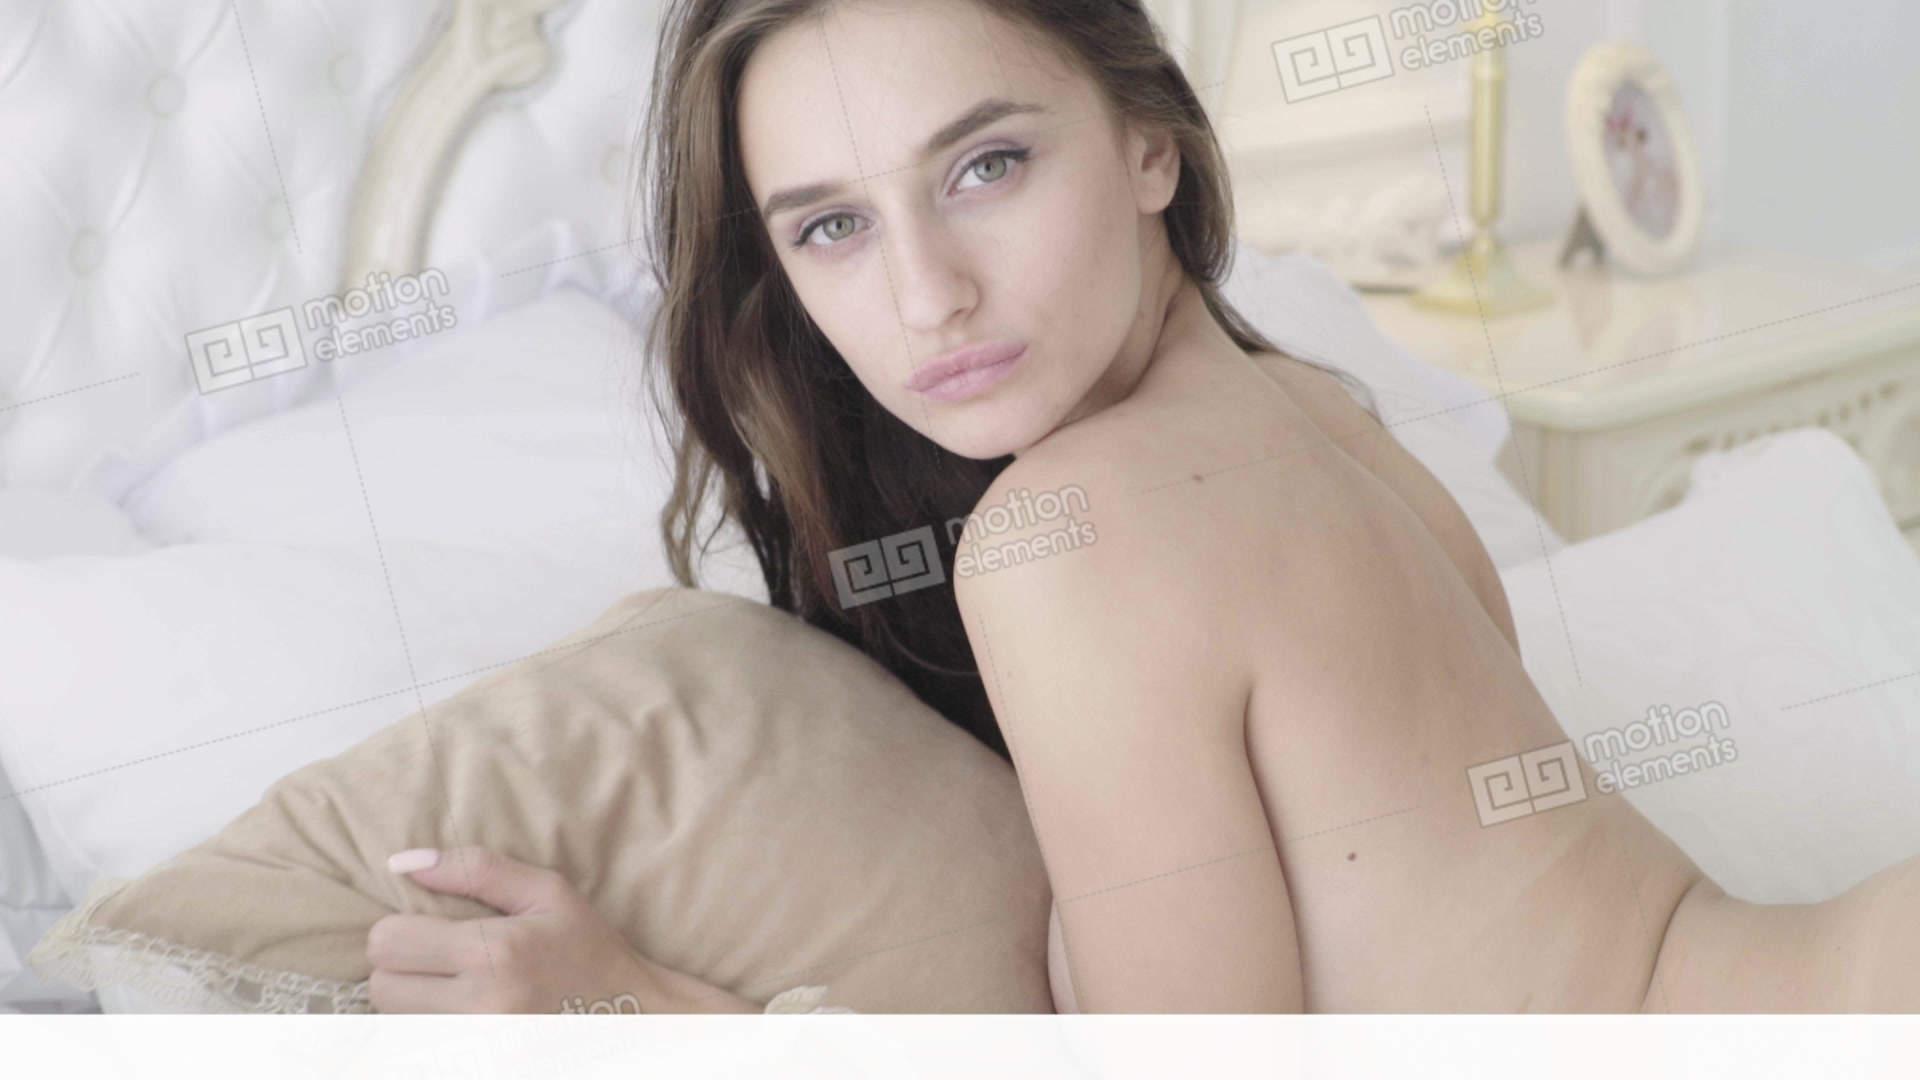 Consider, nude sexy ukrainian girl speaking, would